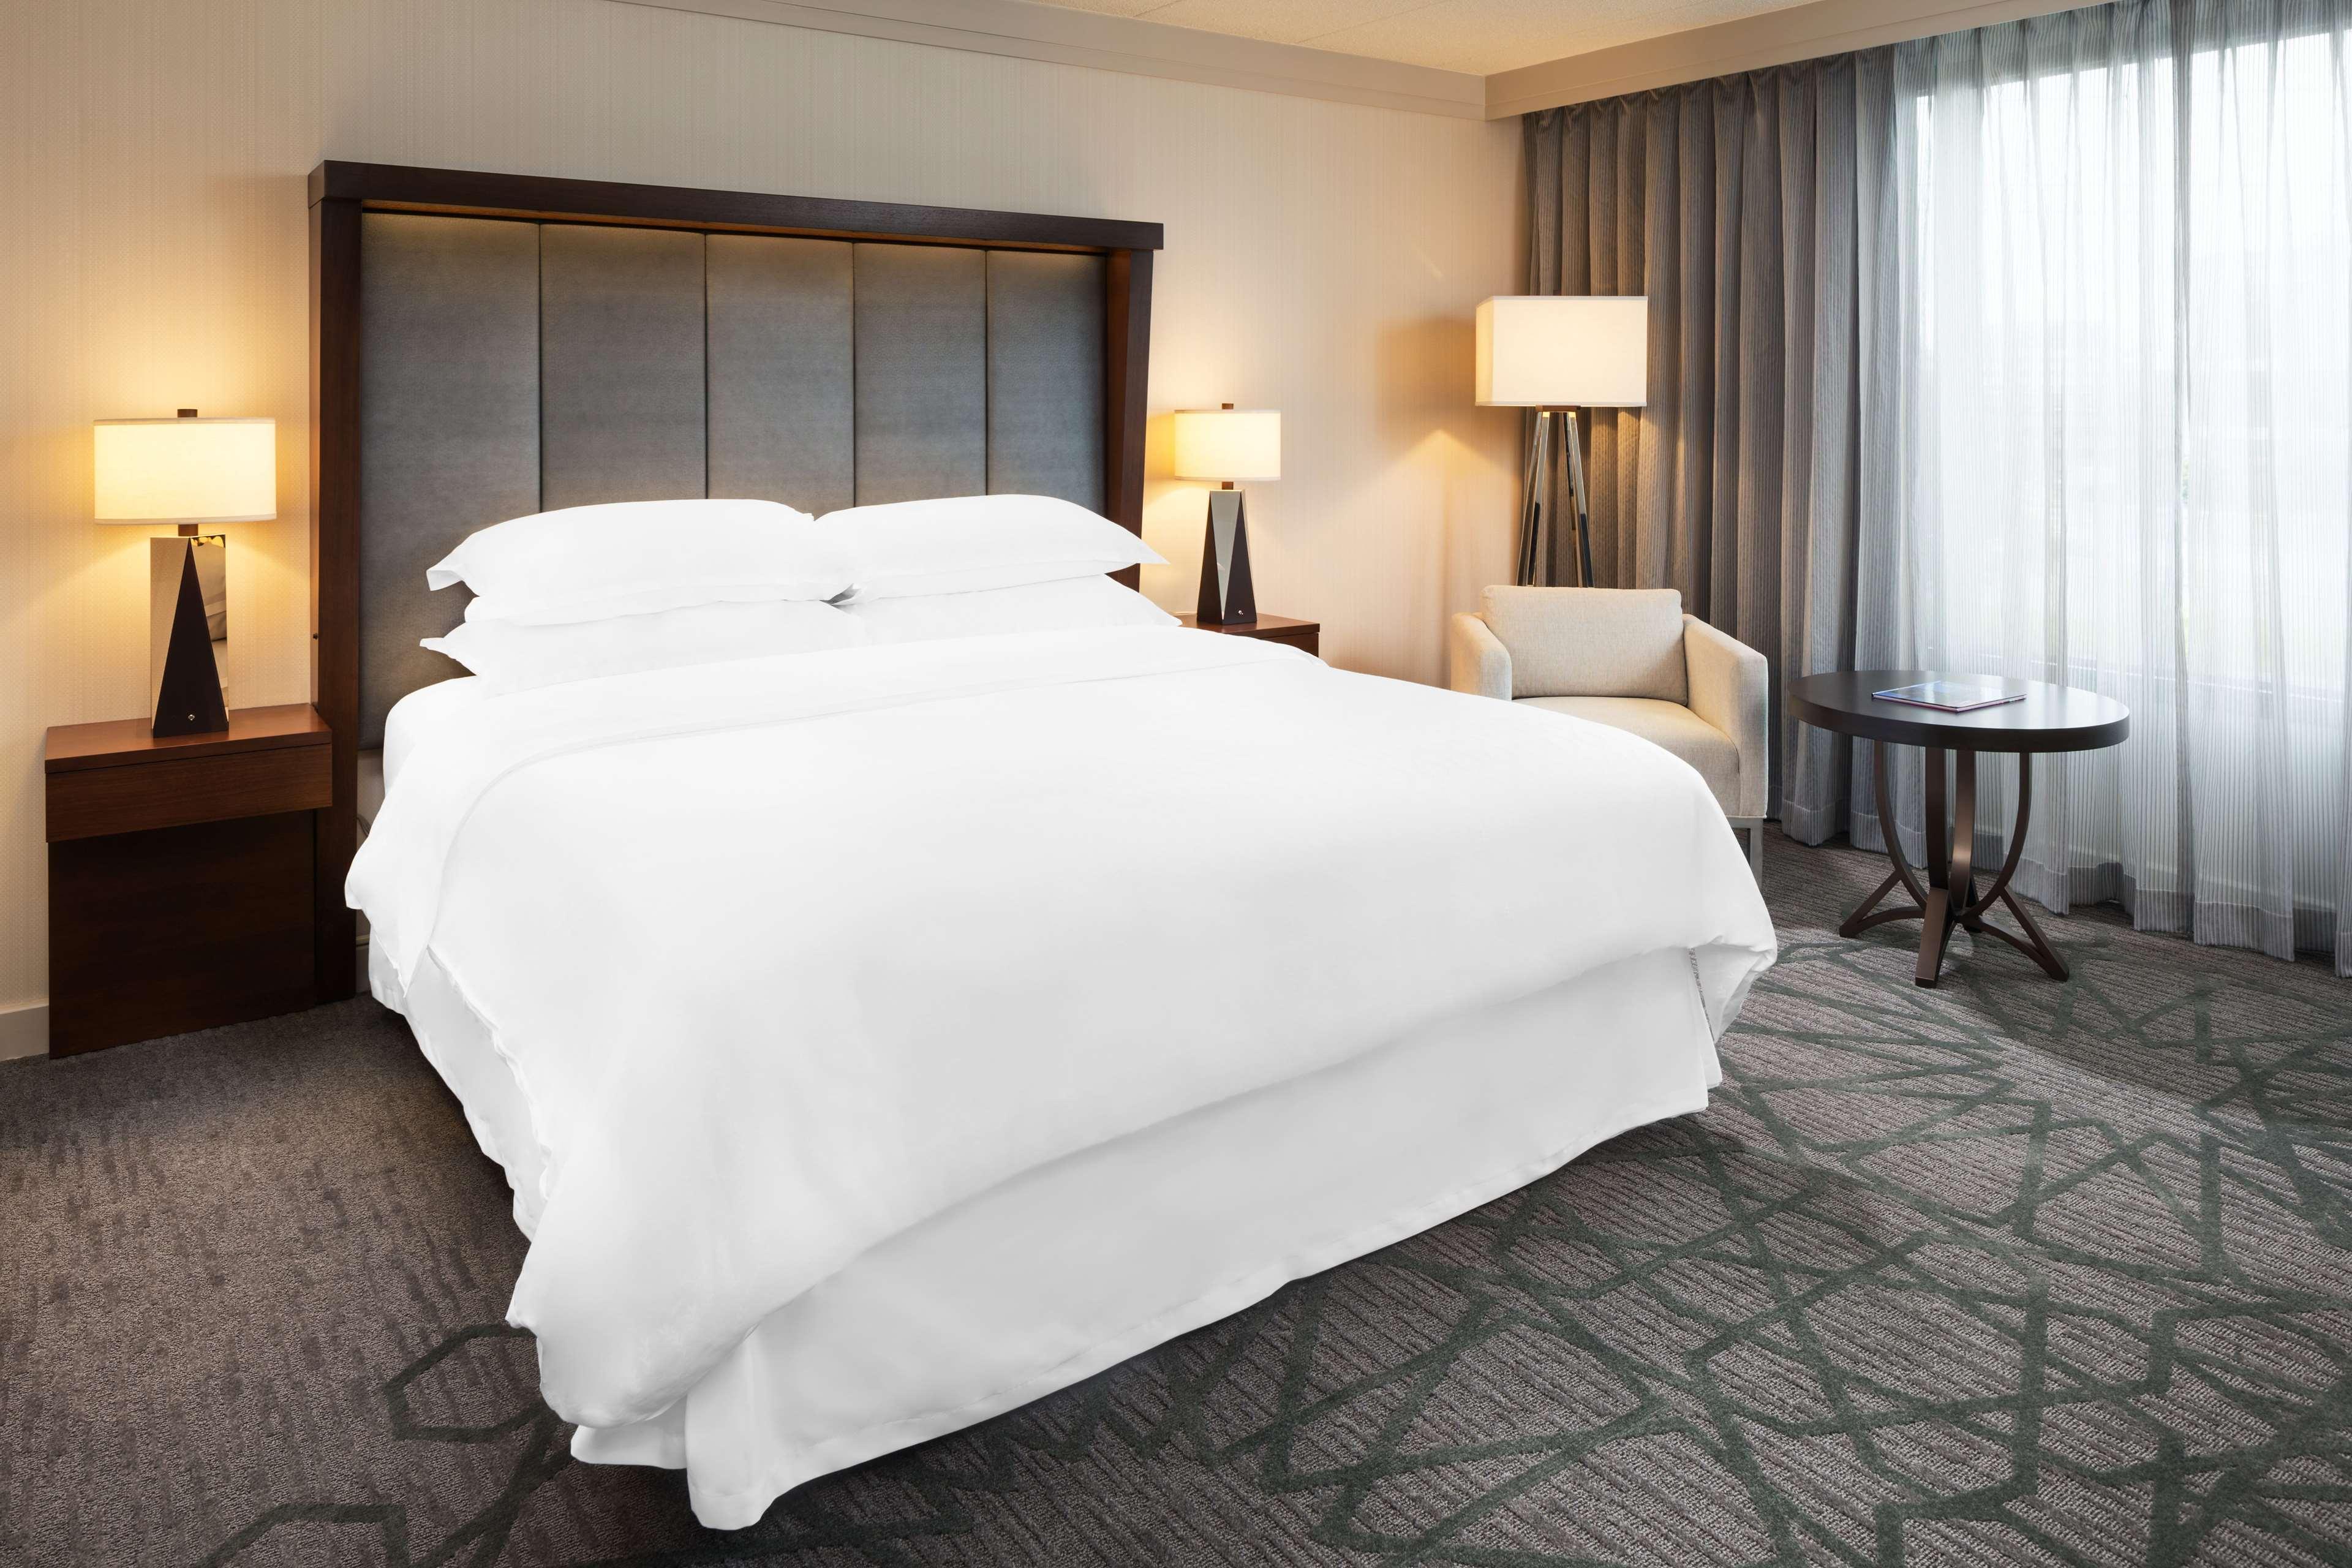 Sheraton Bloomington Hotel image 1